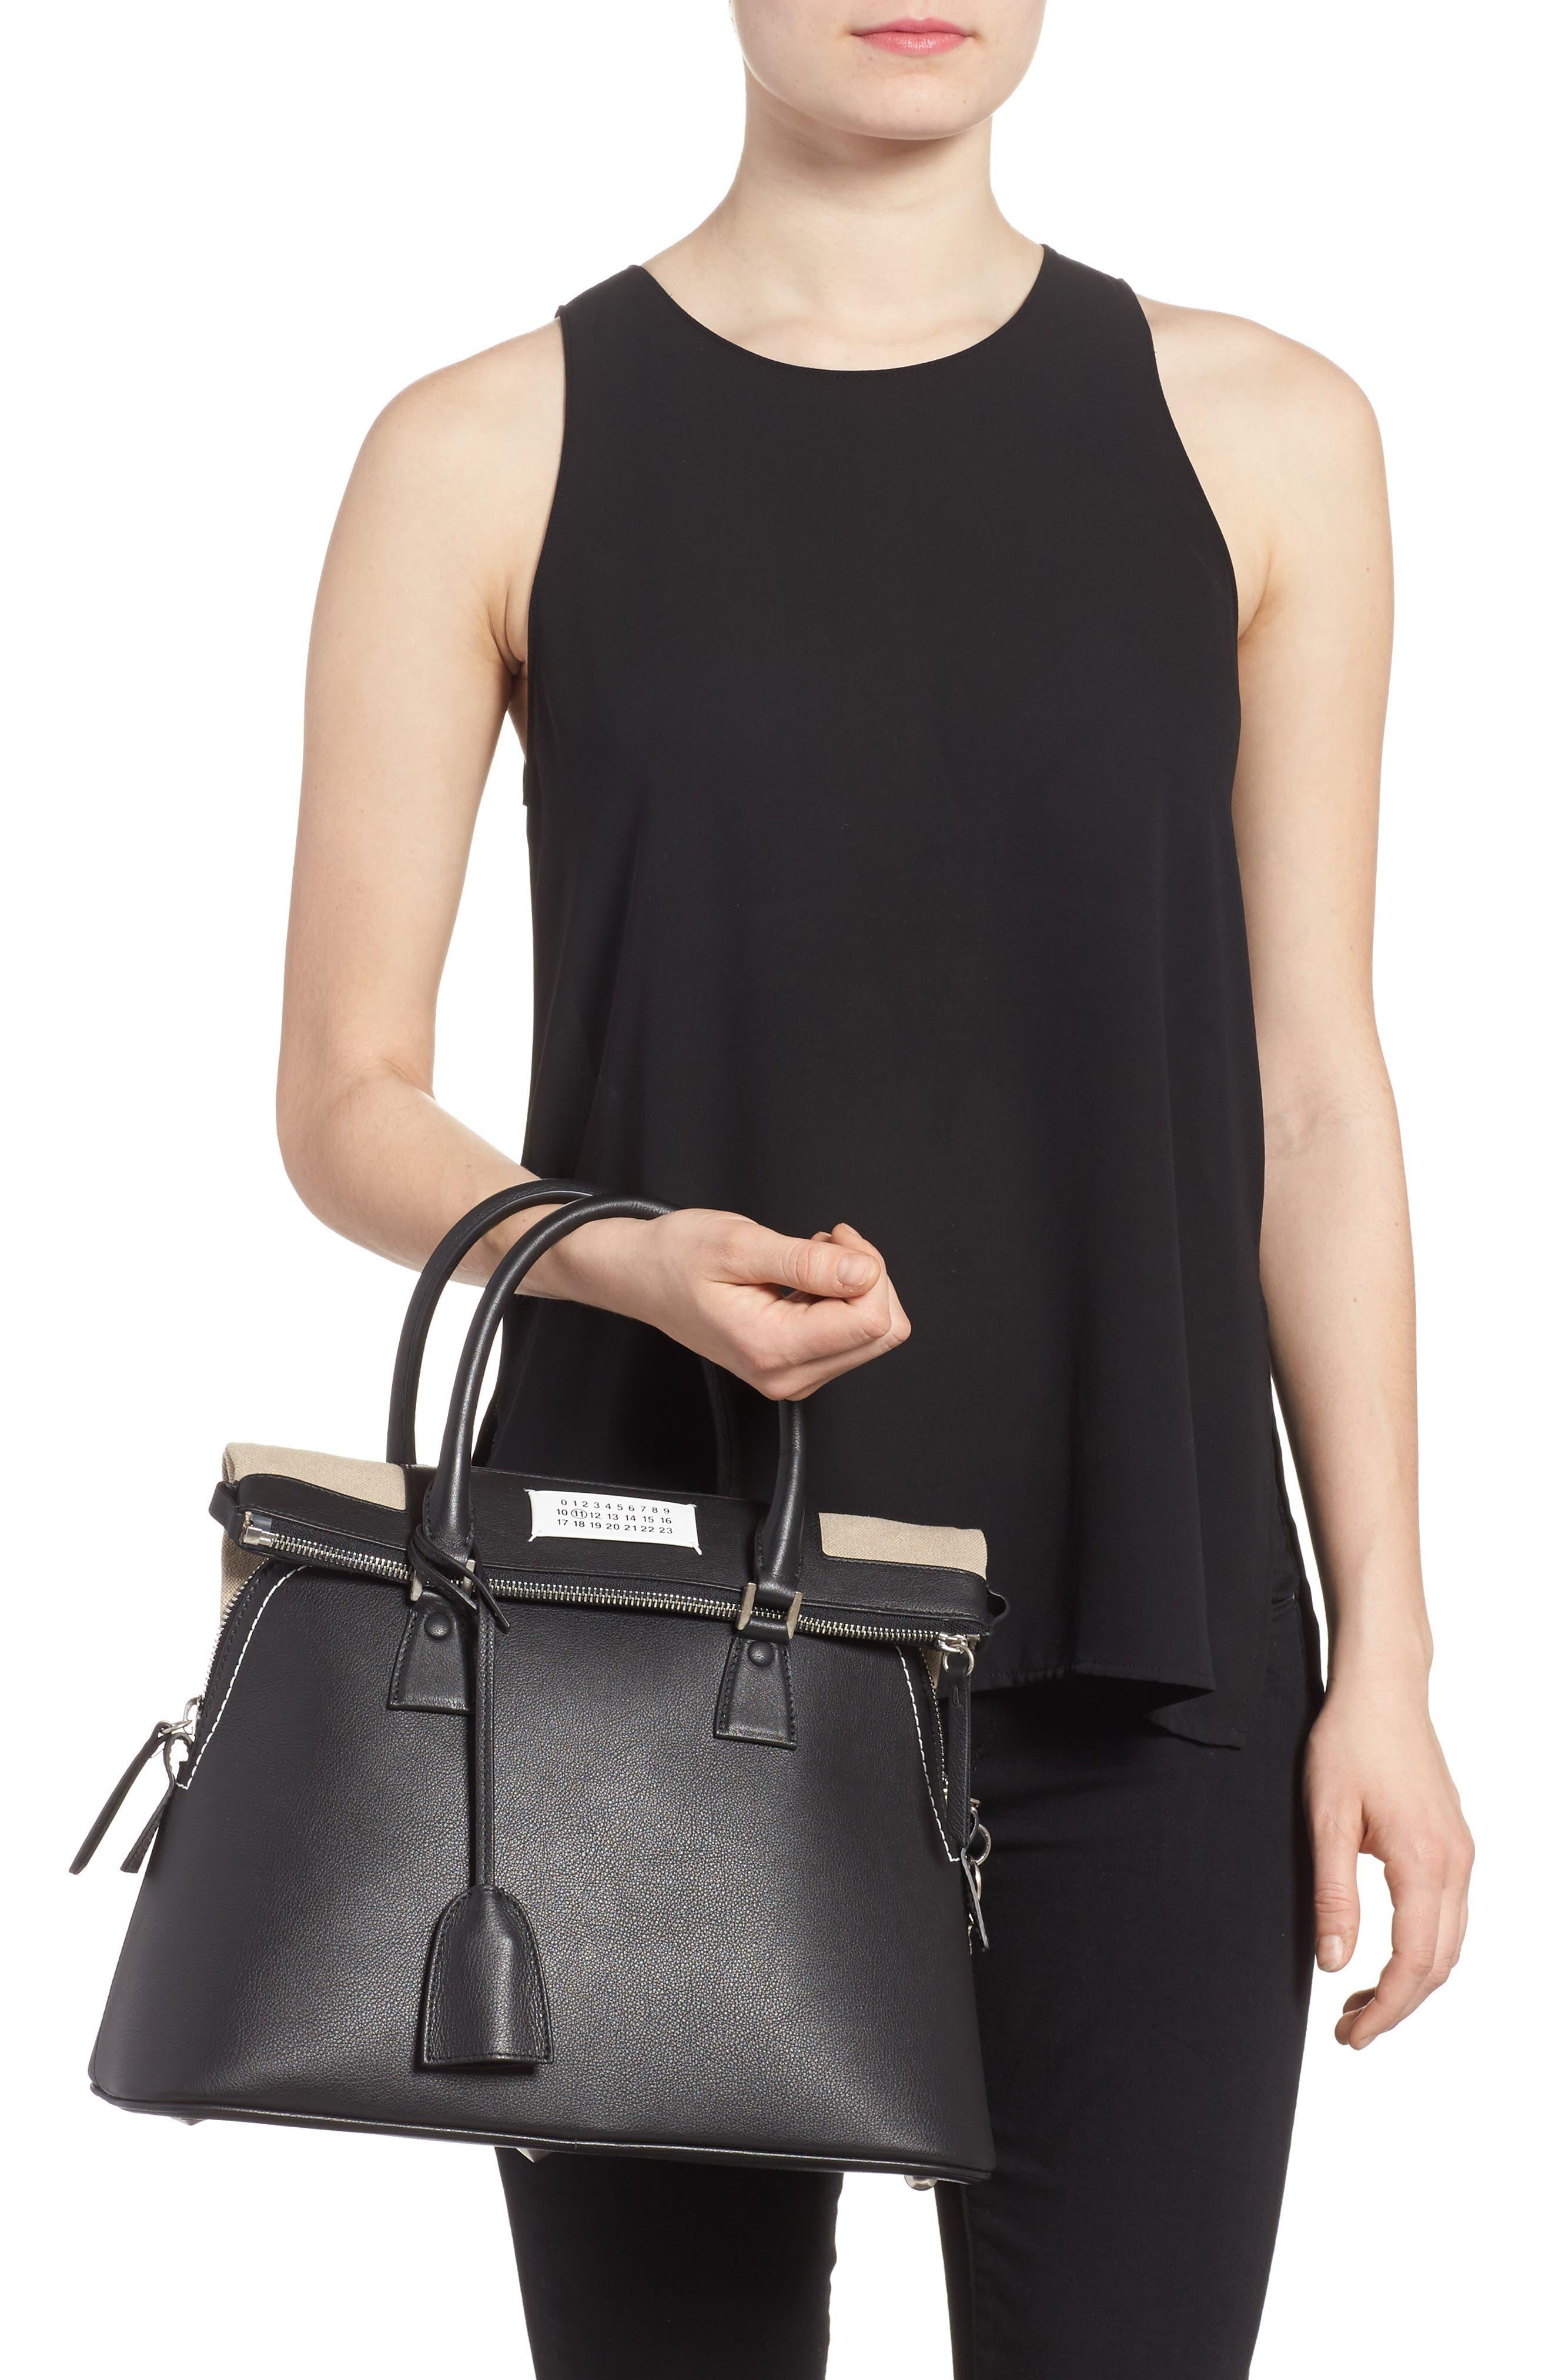 Medium 5AC Leather Handbag,                             Alternate thumbnail 2, color,                             Black